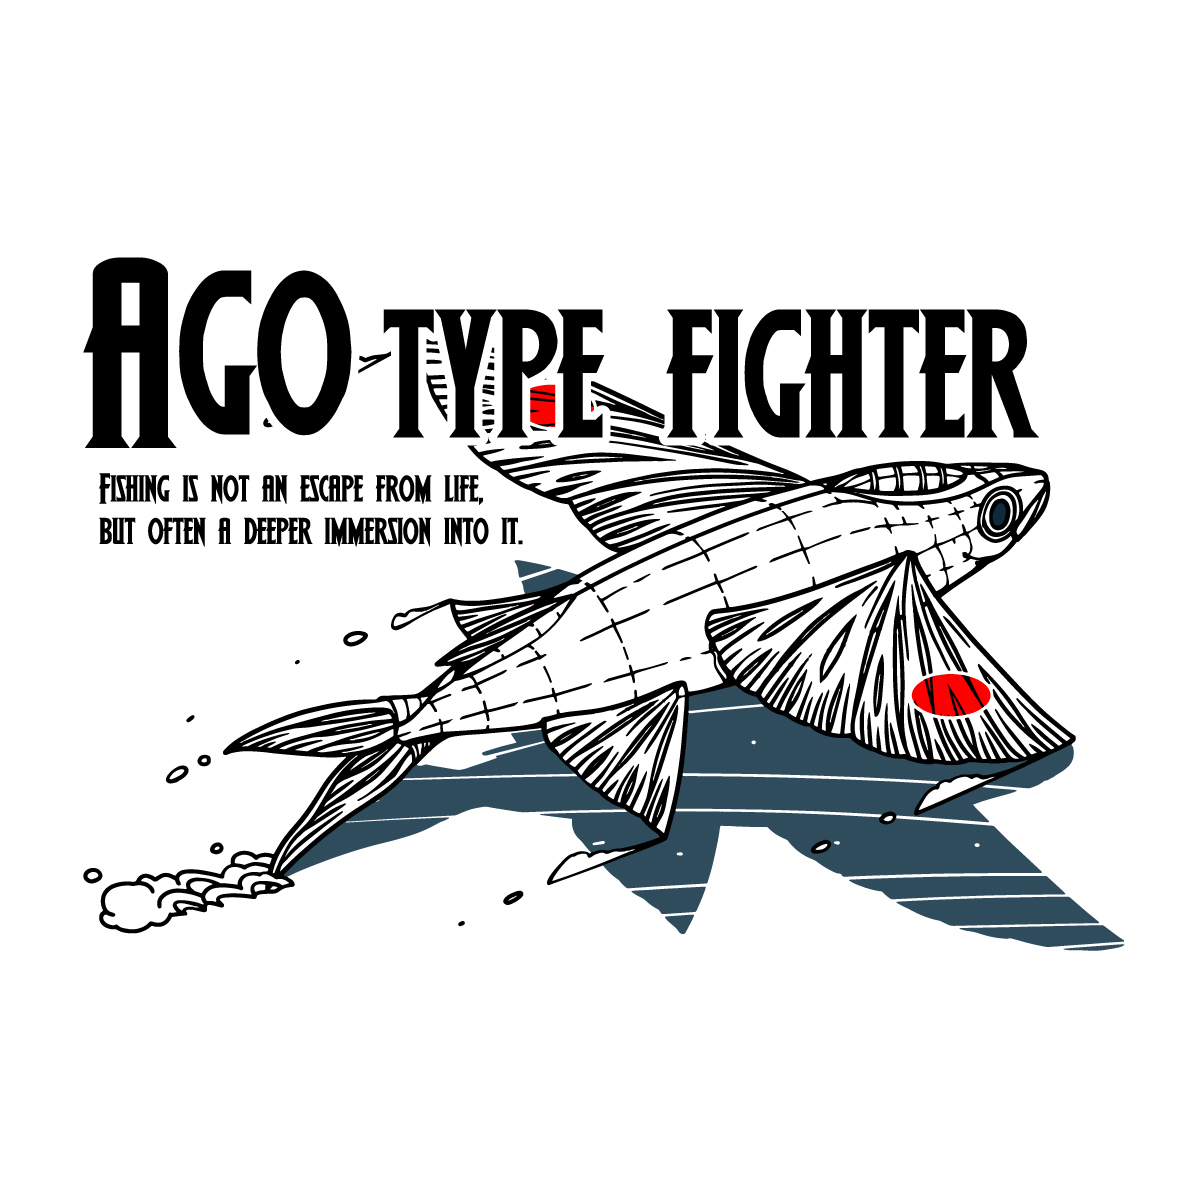 AGO TYPE FIGHTER